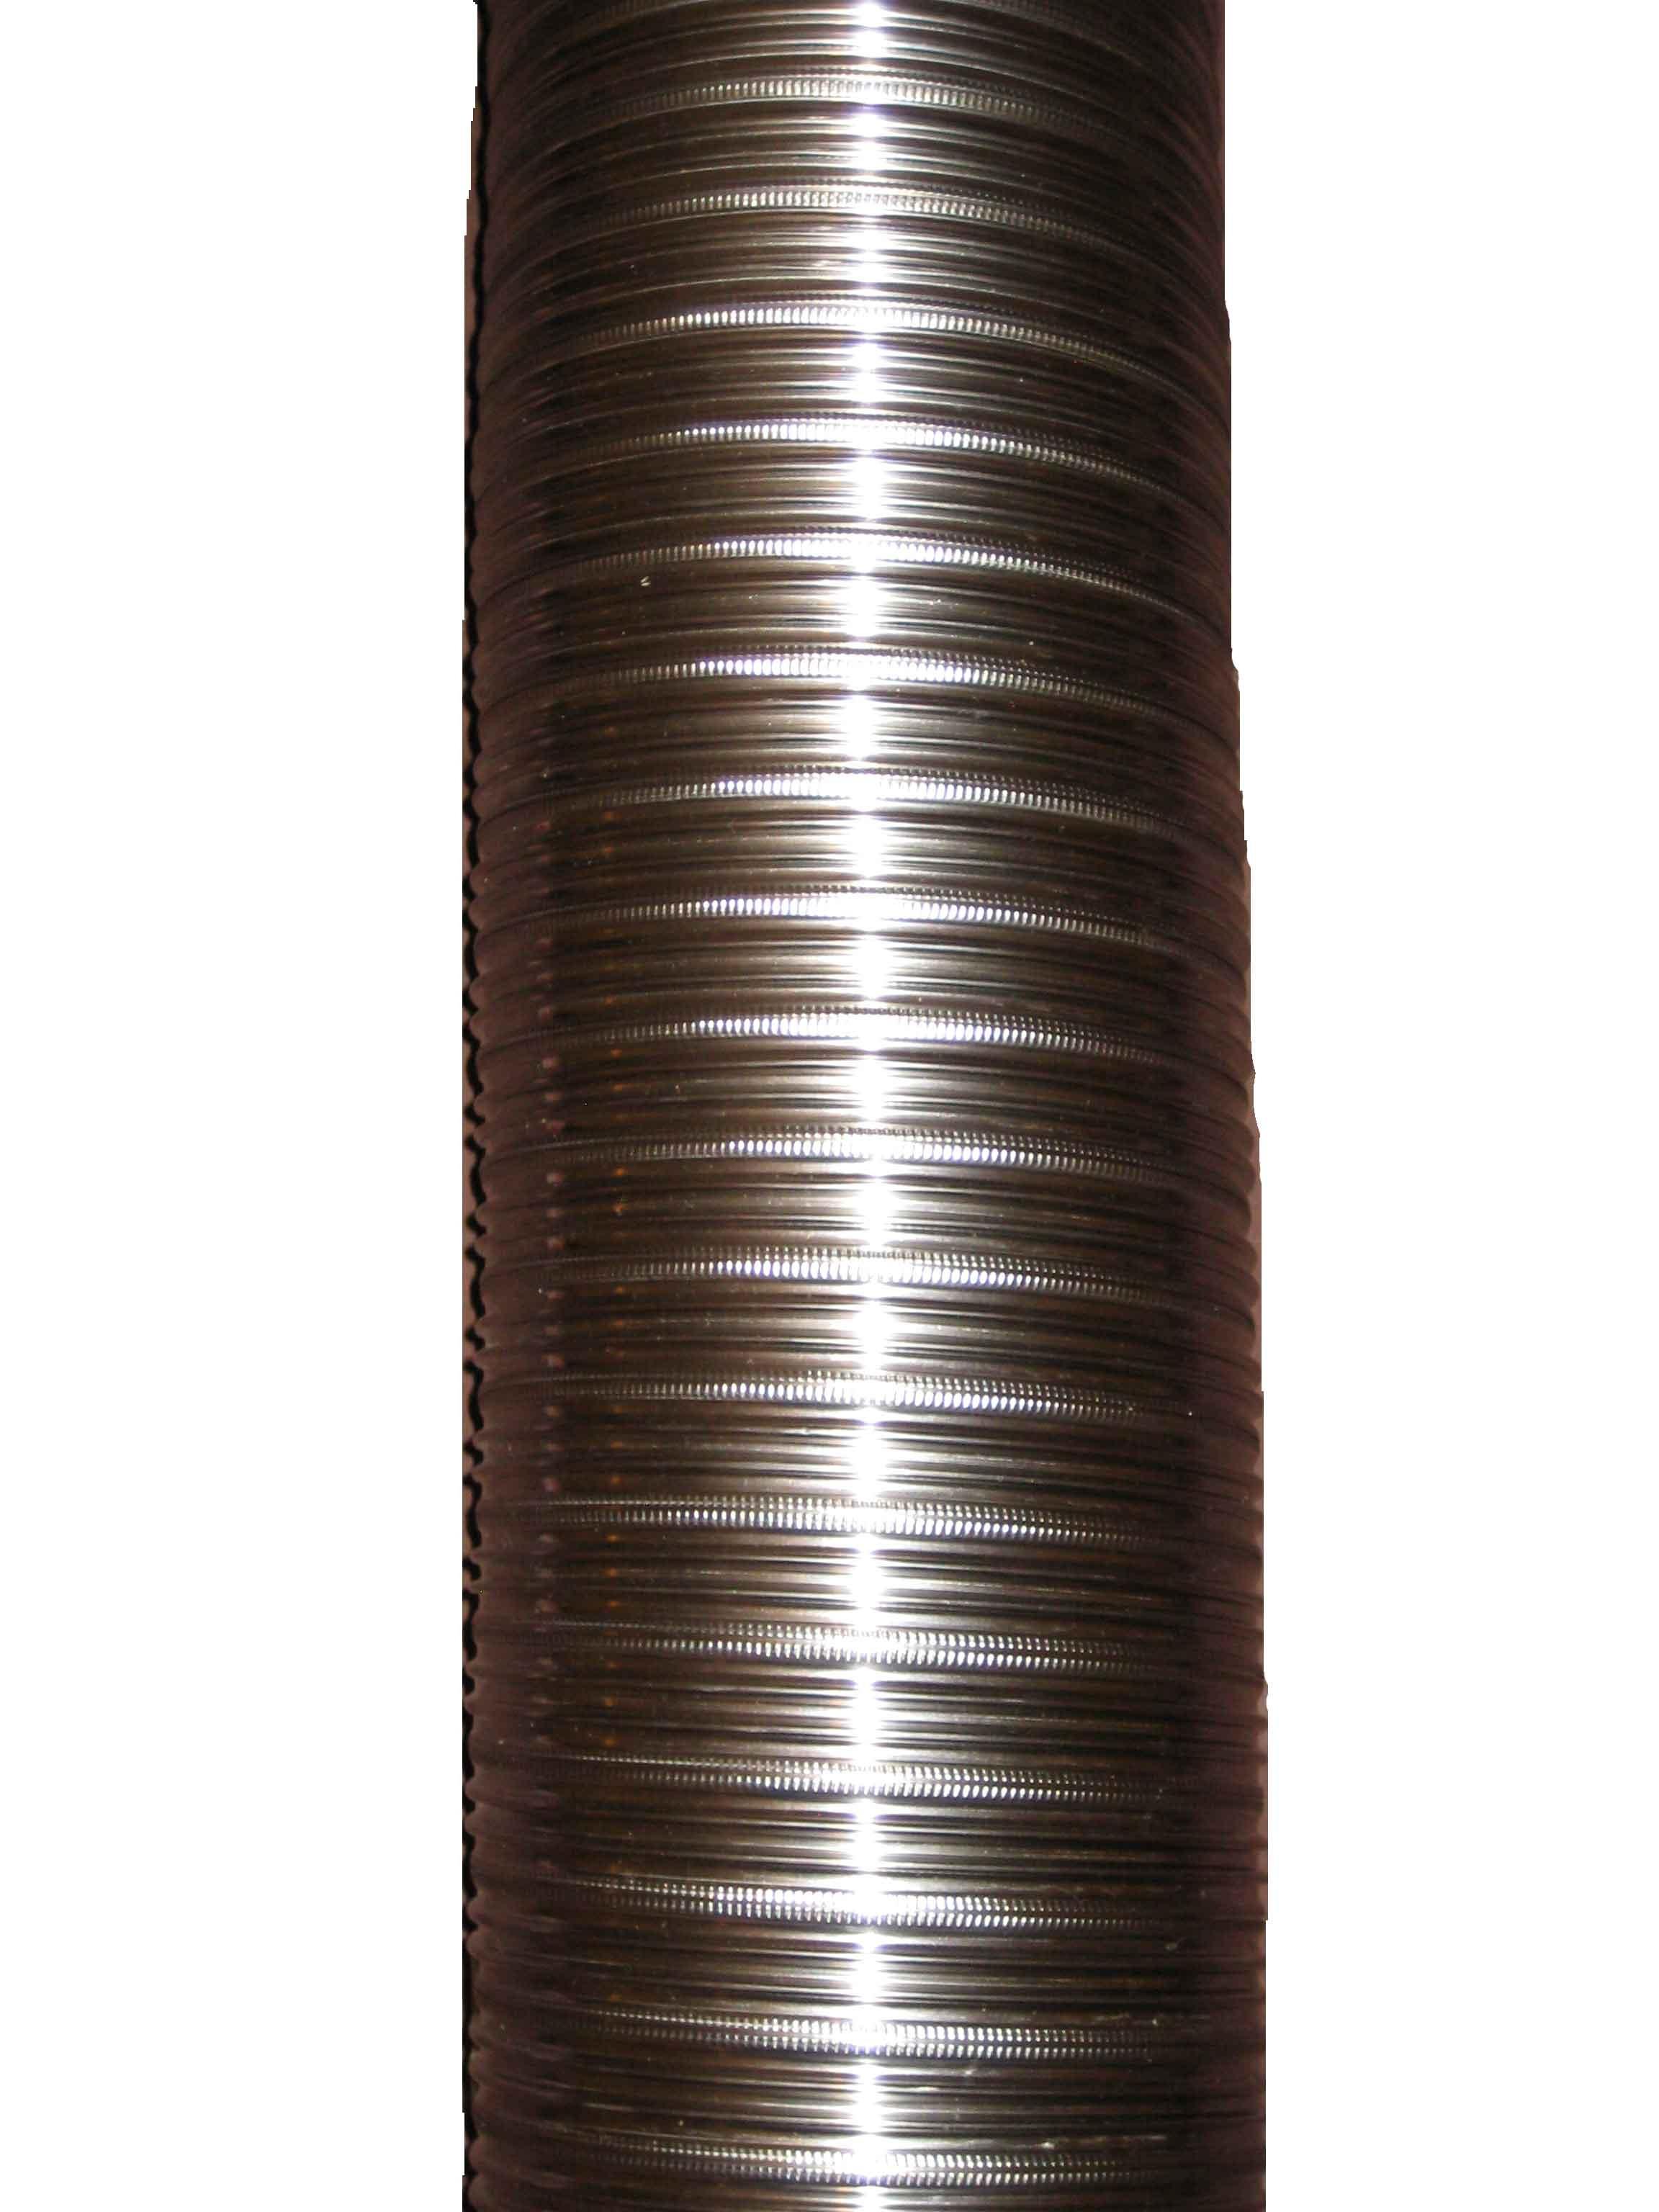 6m 125mm 316/316 Twin Wall Flexible Flue Liner